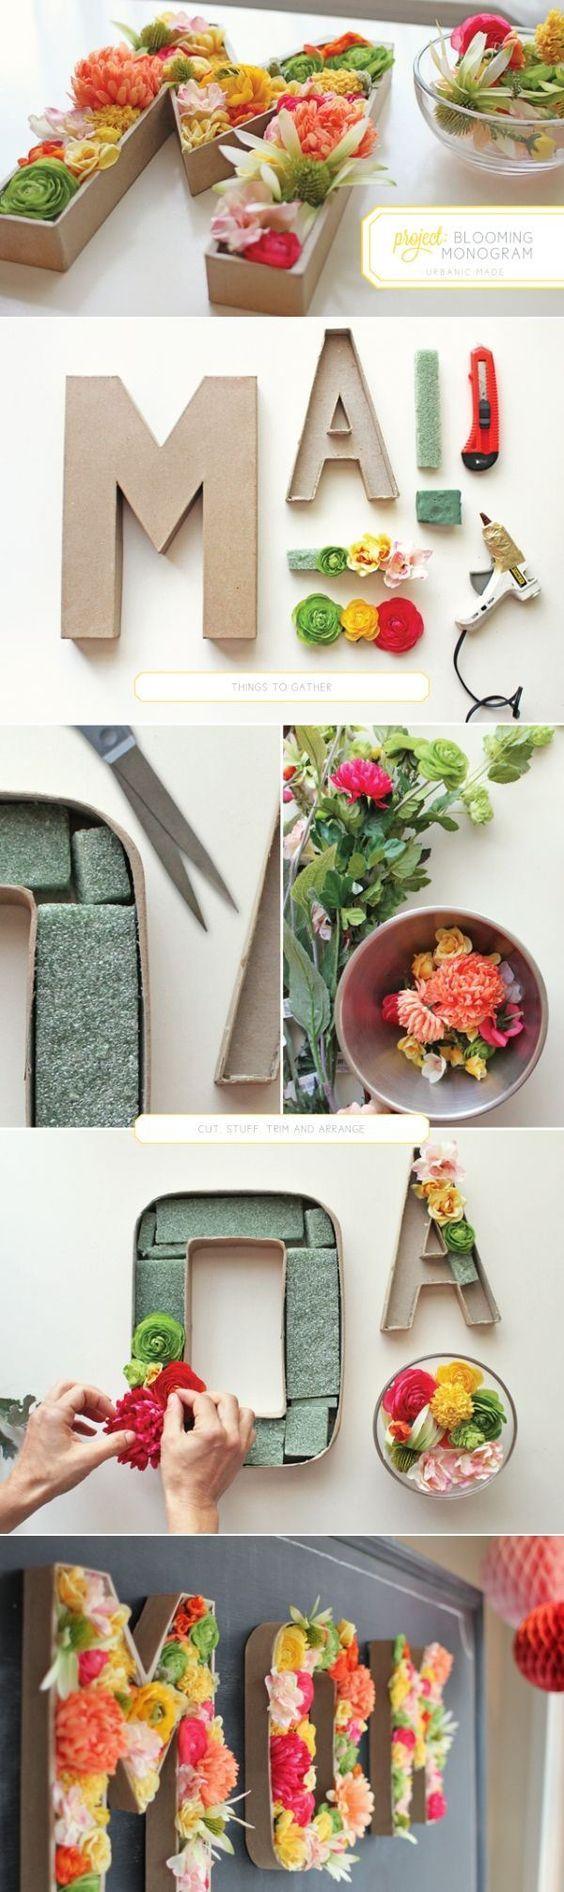 Project: Blooming Monogram   DIY Fun Tips